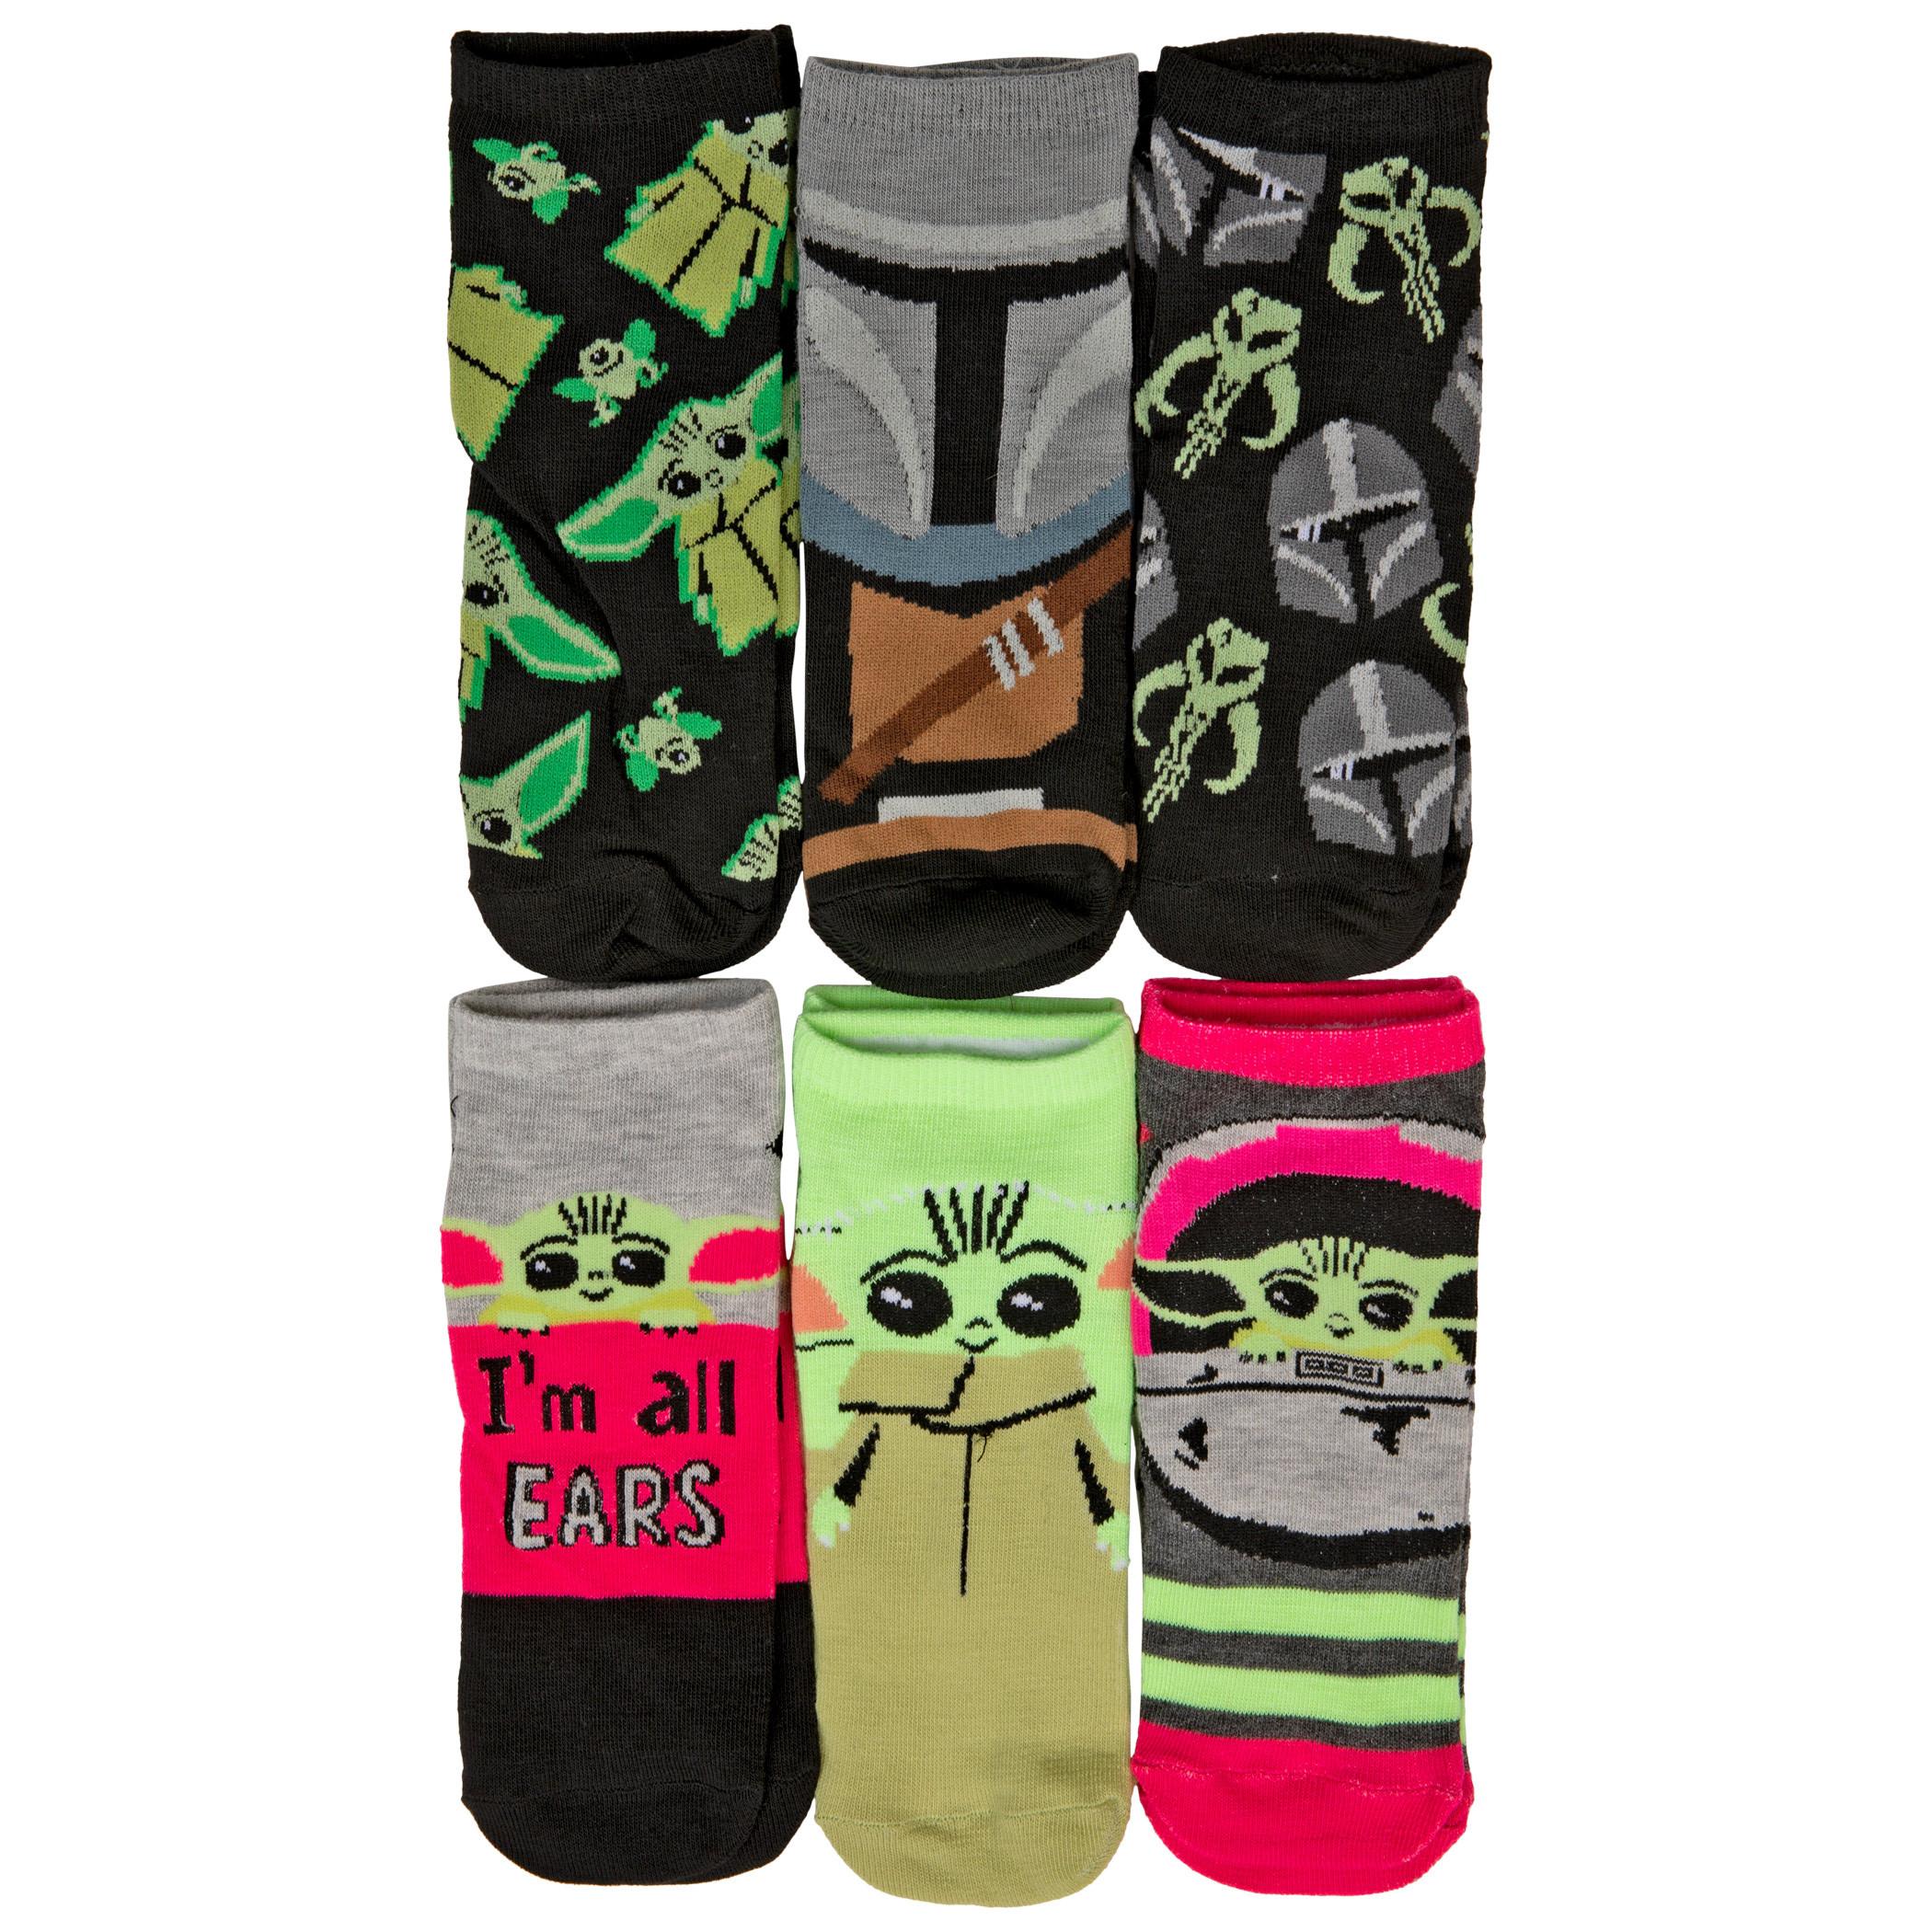 Star Wars the Mandalorian The Child Grogu Women's 6-Pack of Shorties Socks